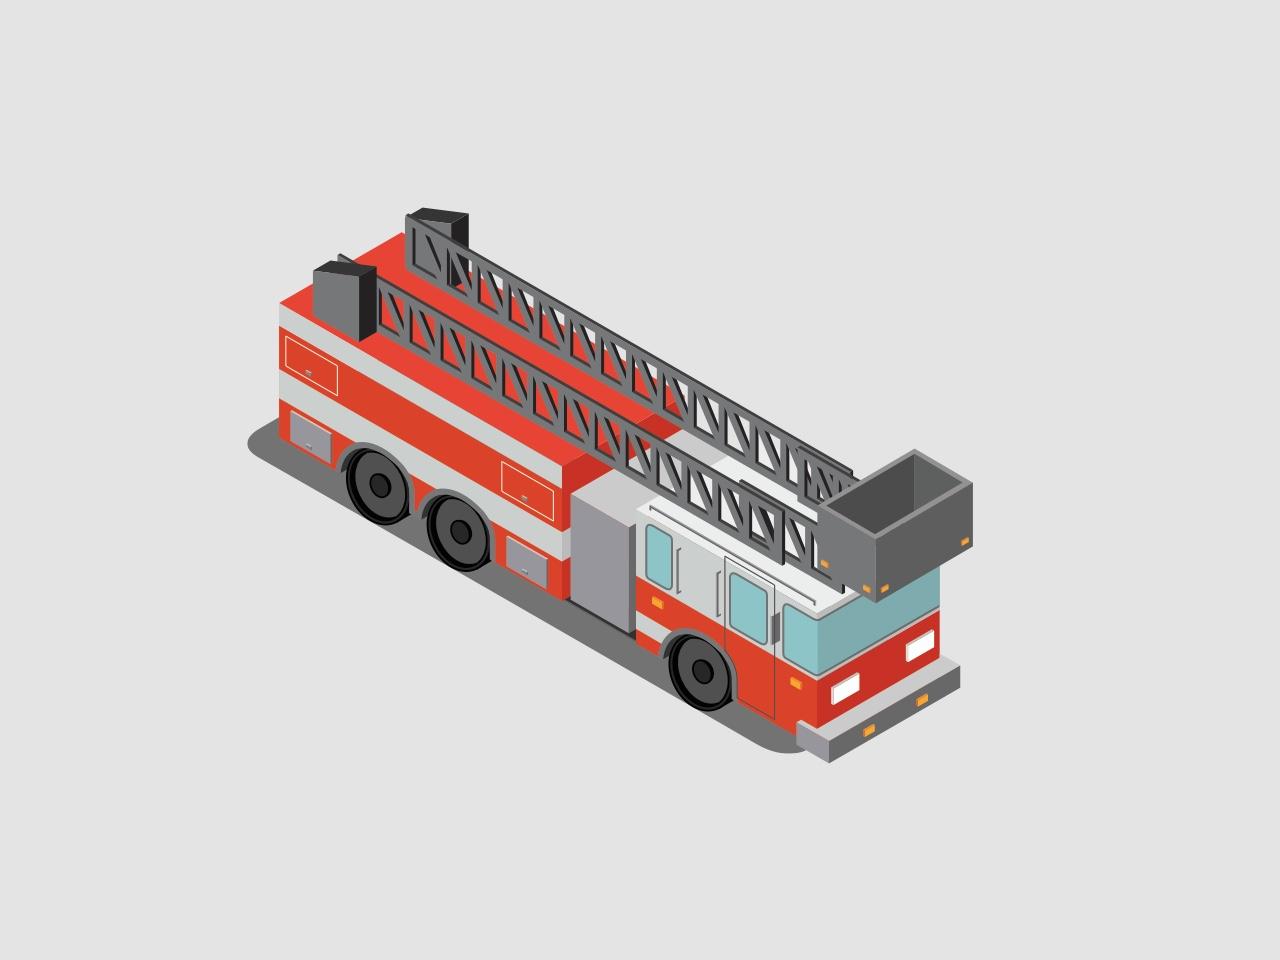 ping-firetruck.jpg